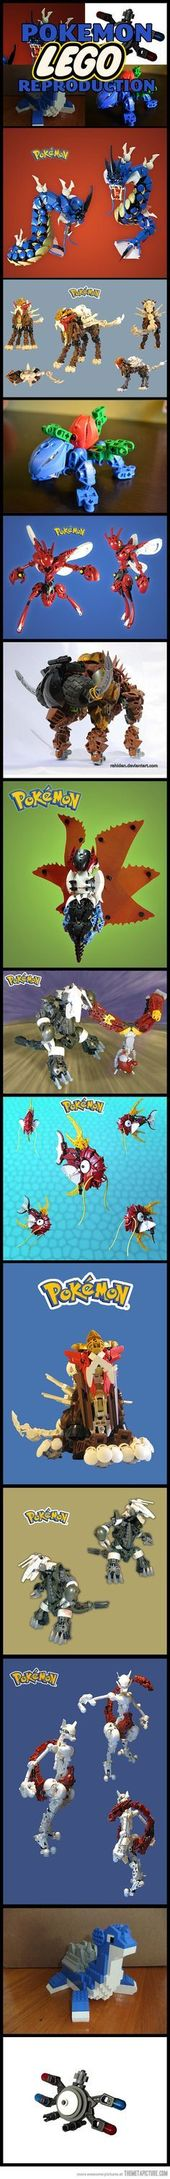 Coole Pokemon Lego-Rekonstruktionen … – #Coole #LegoReconstructions #Pokemon   – lego avengers